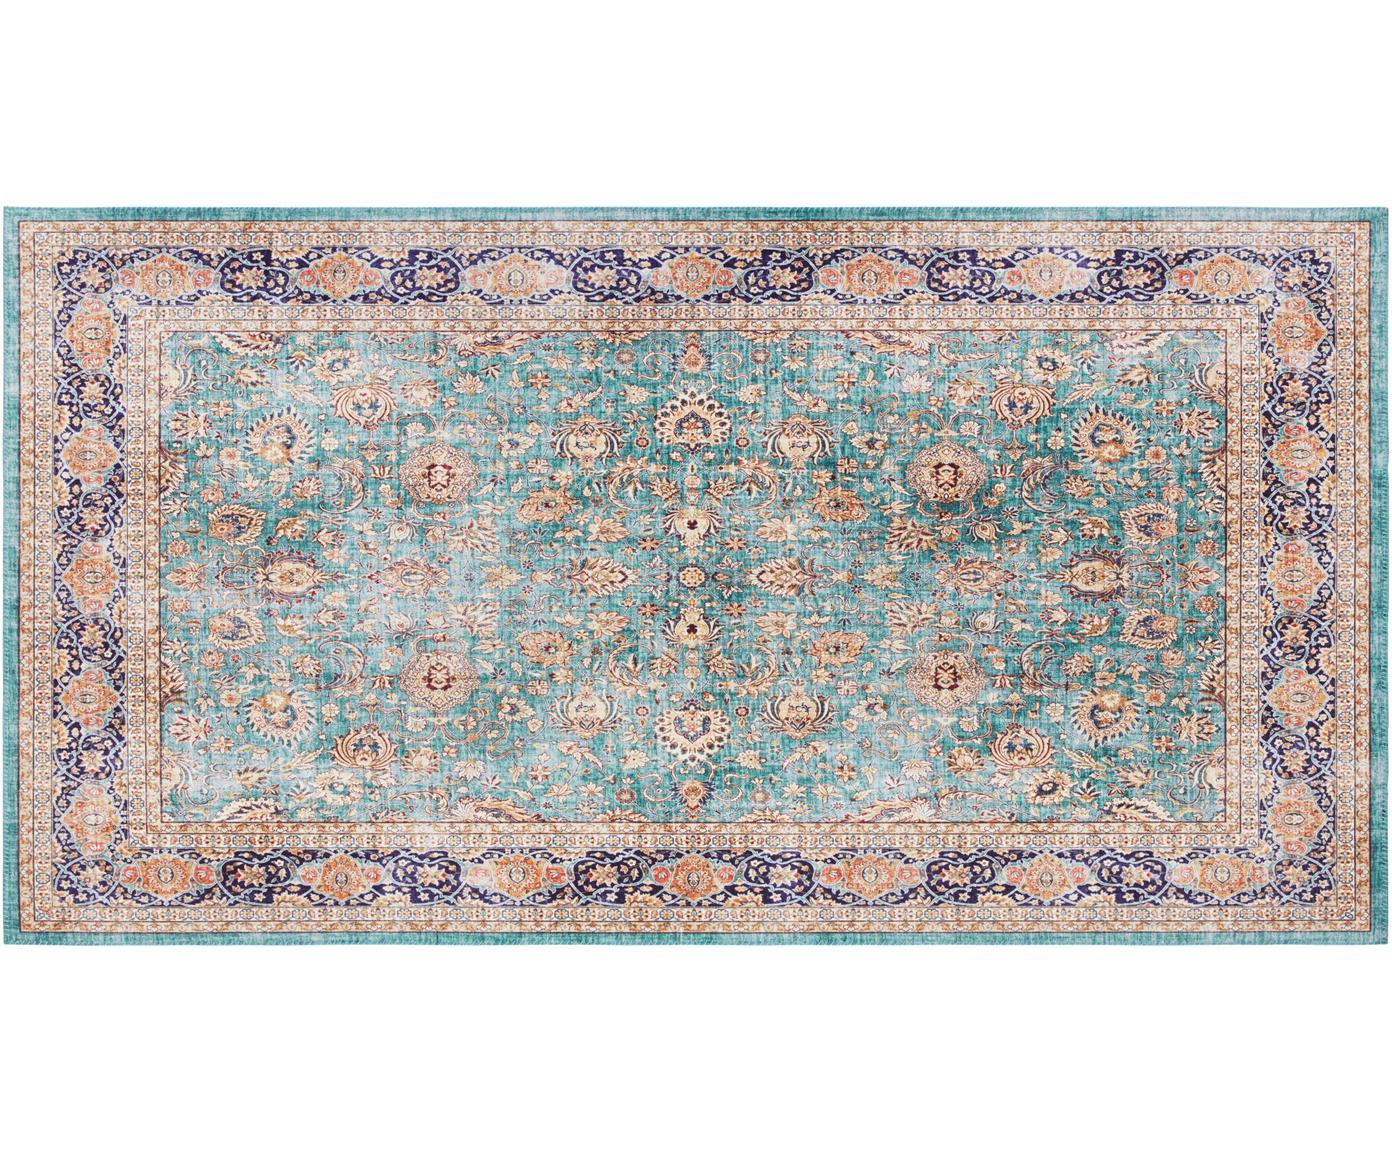 Teppich Keshan Maschad im Orient Style, Jadegrün, Mehrfarbig, B 80 x L 150 cm (Größe XS)